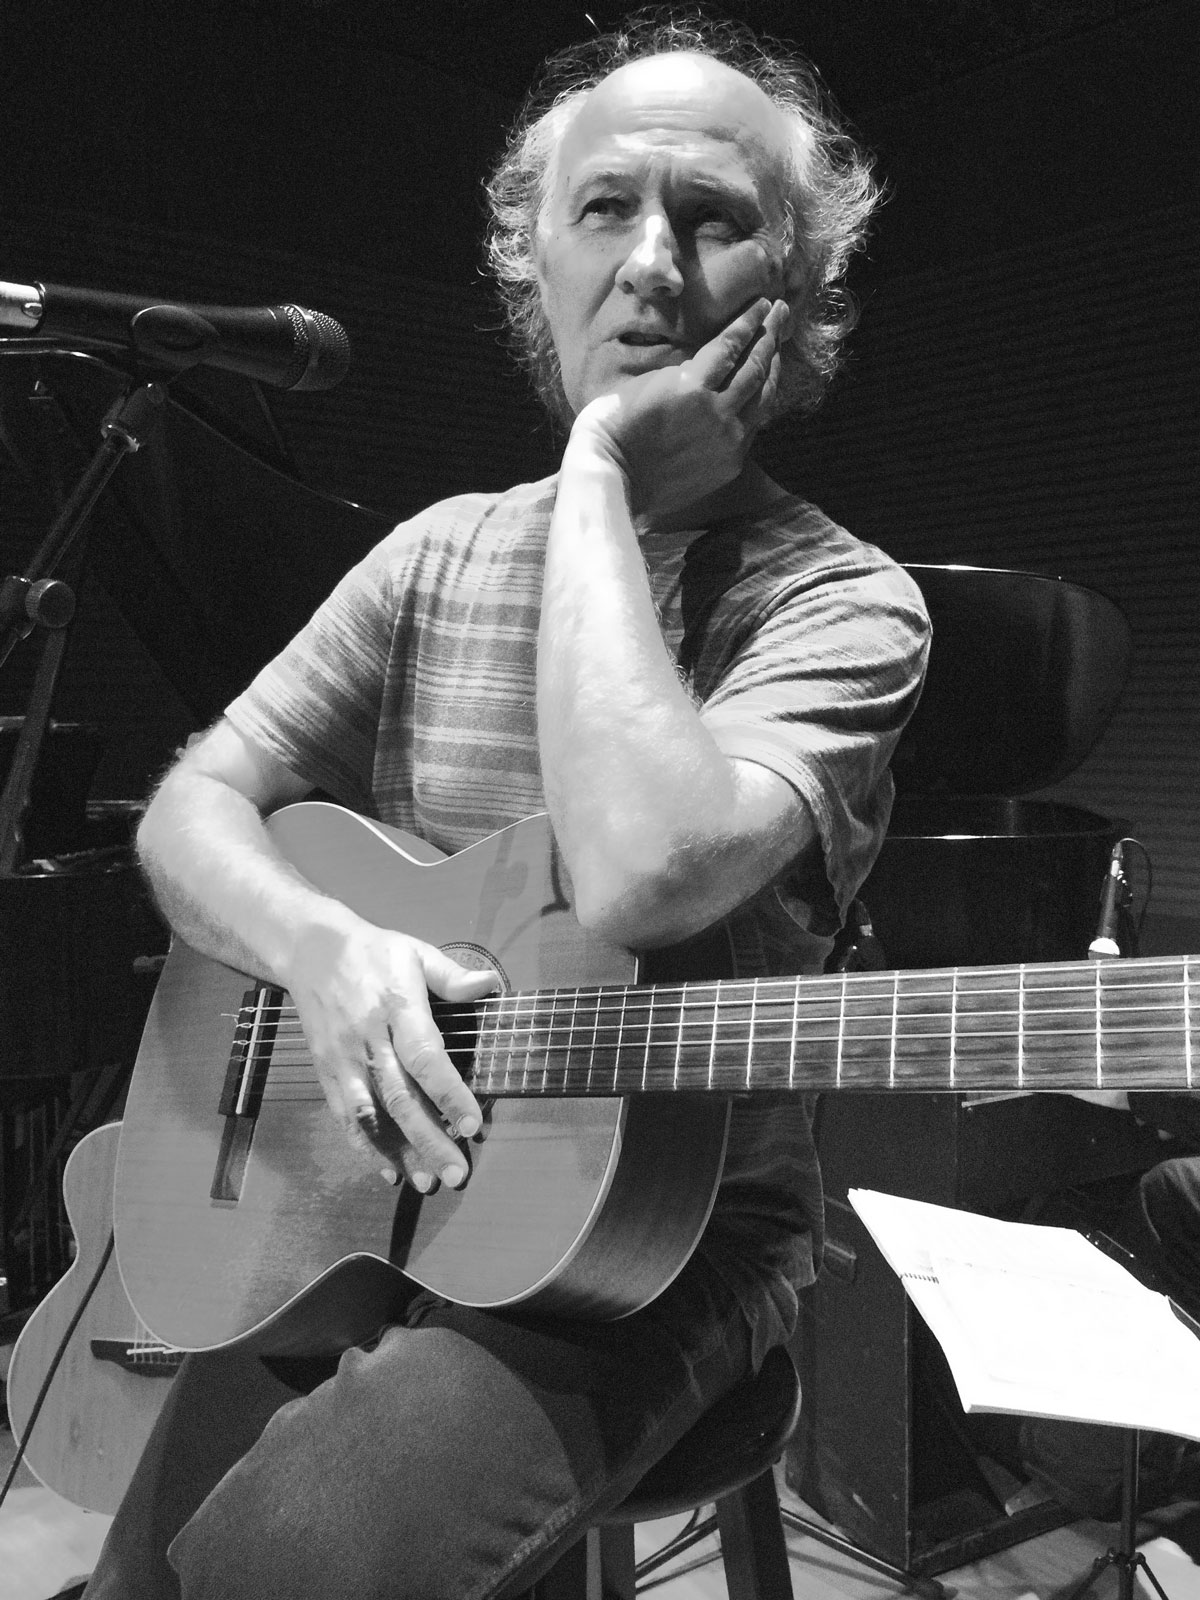 Benoit Le Blanc